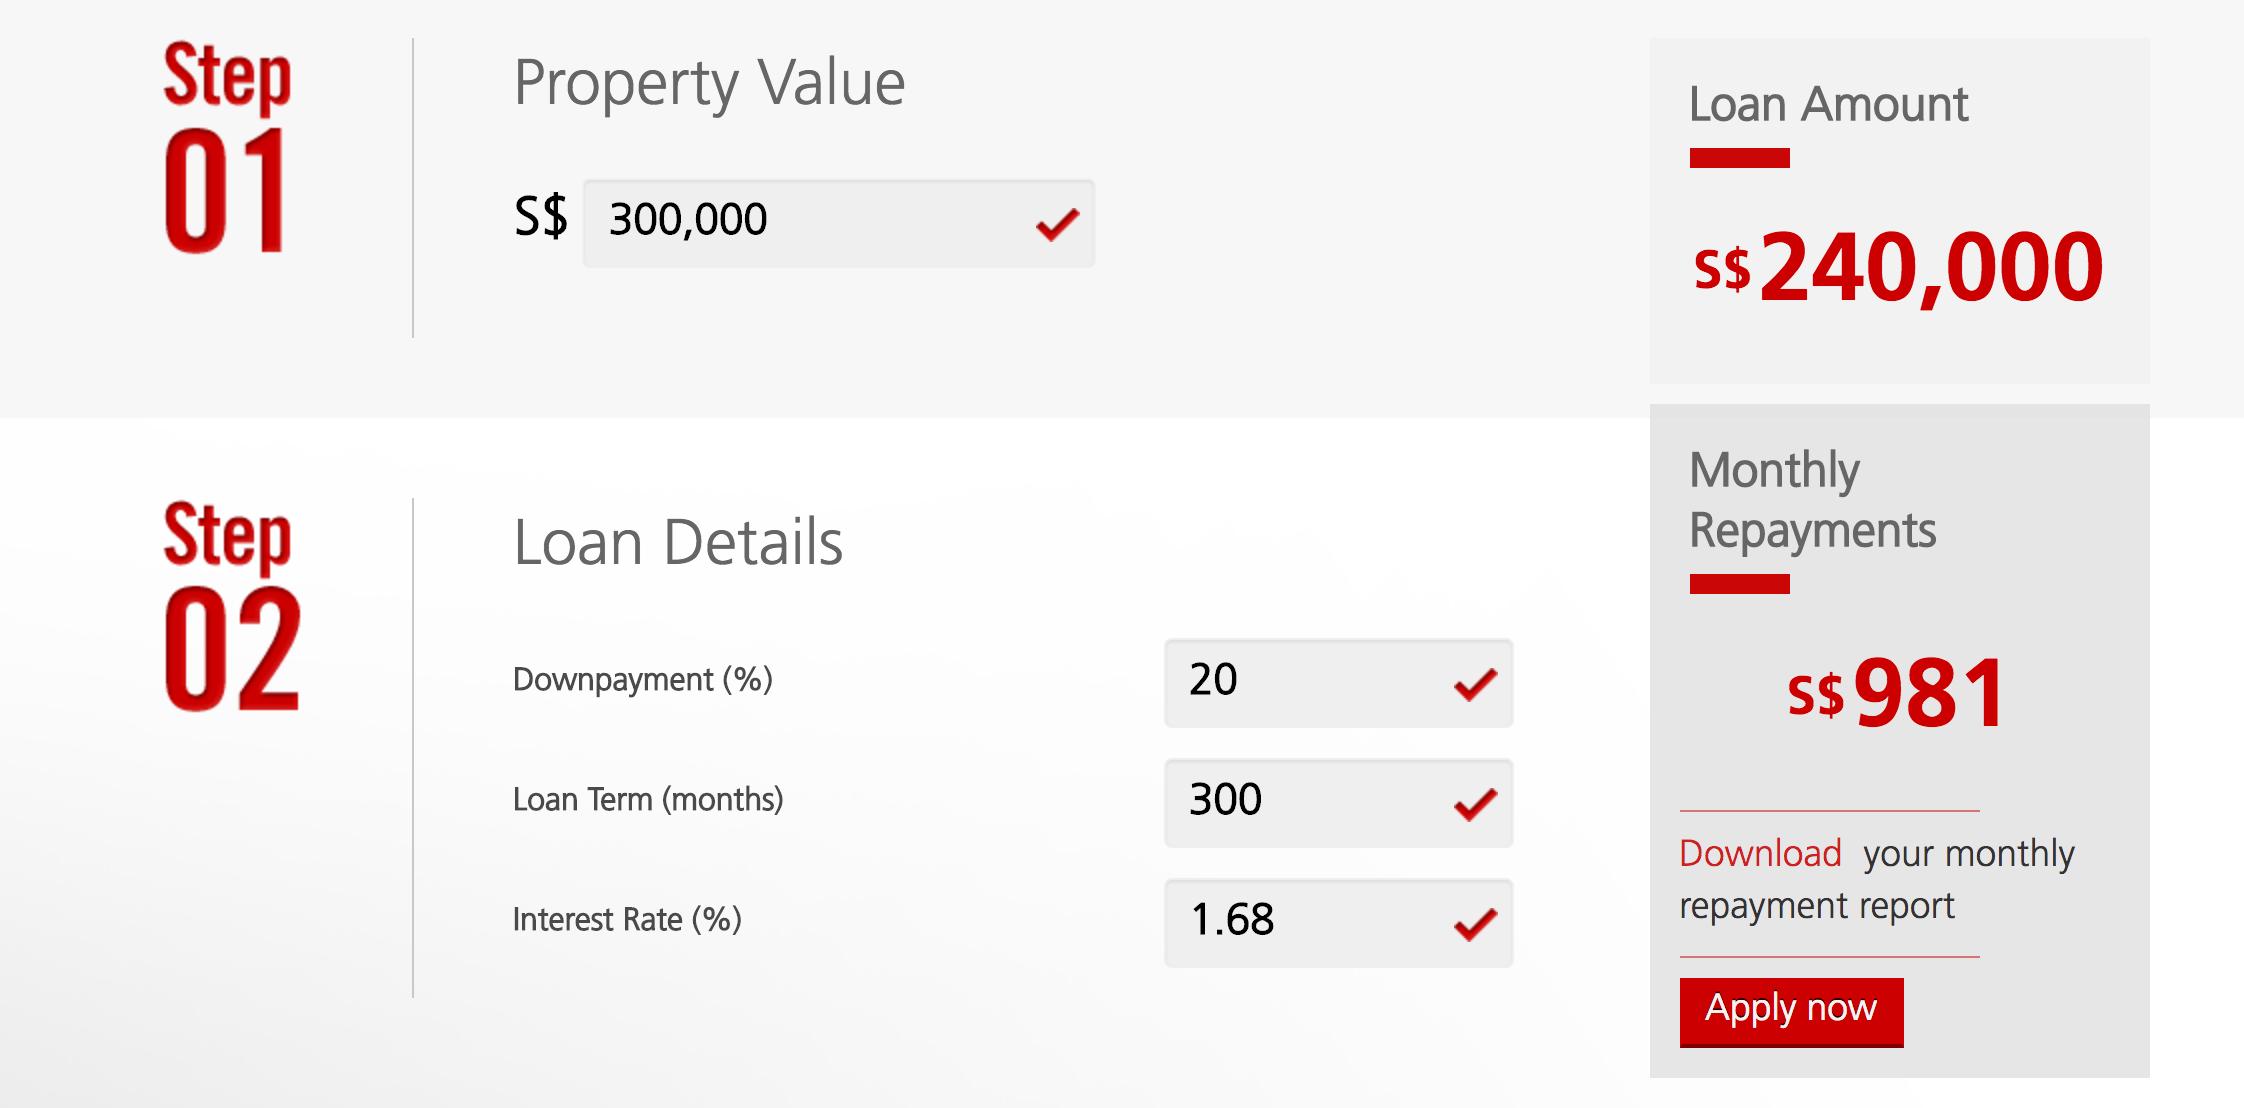 DBS Home Loan Repayment Calculator